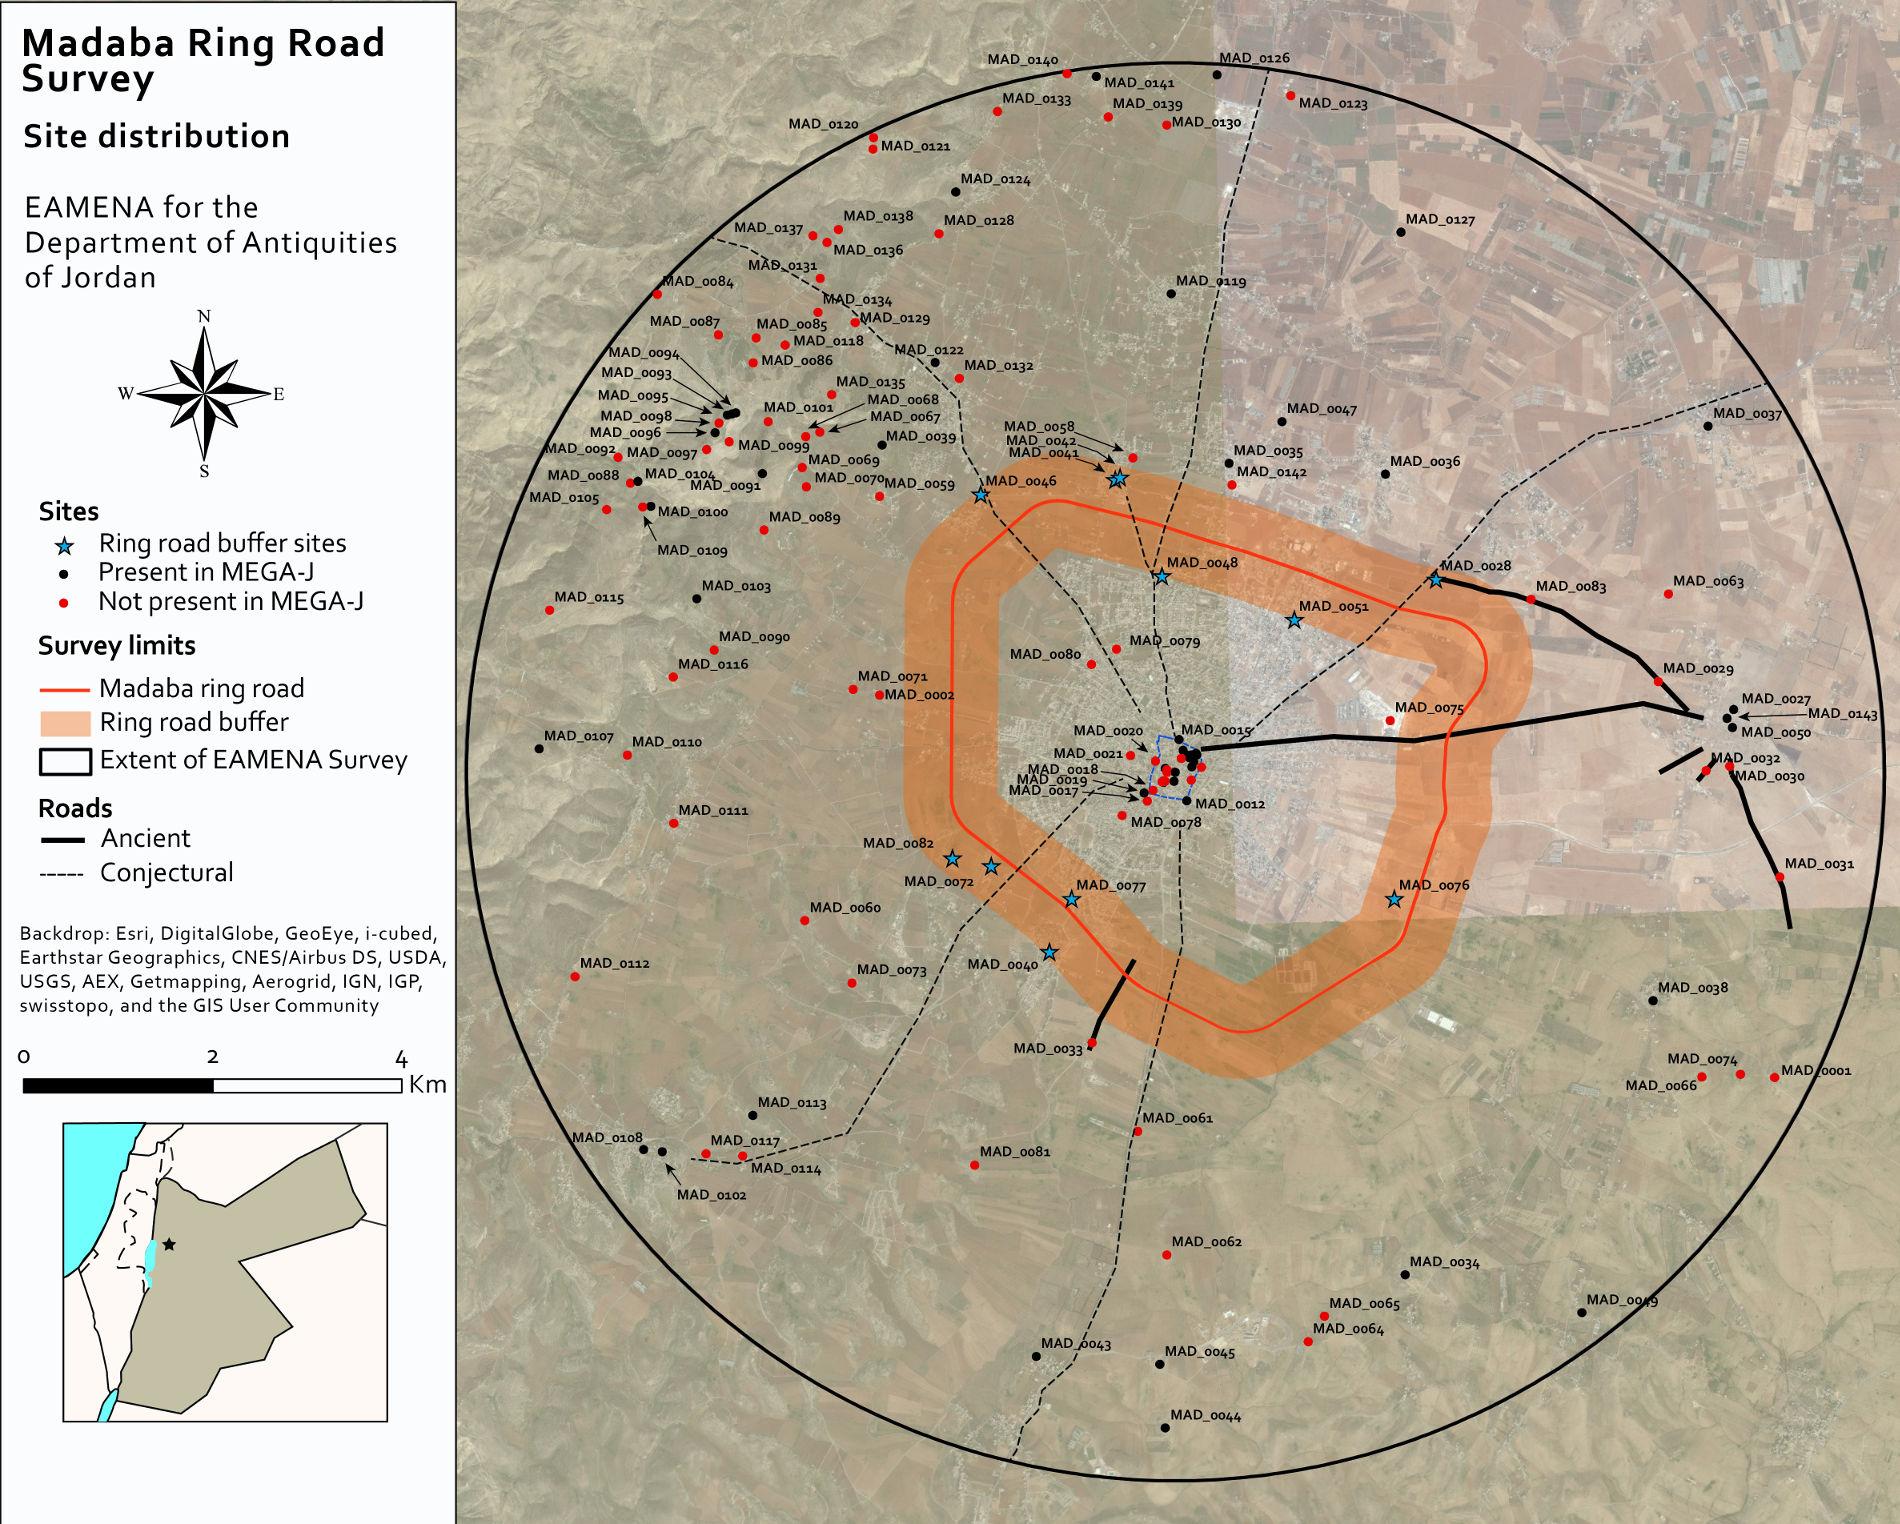 Madaba Ring Road Survey